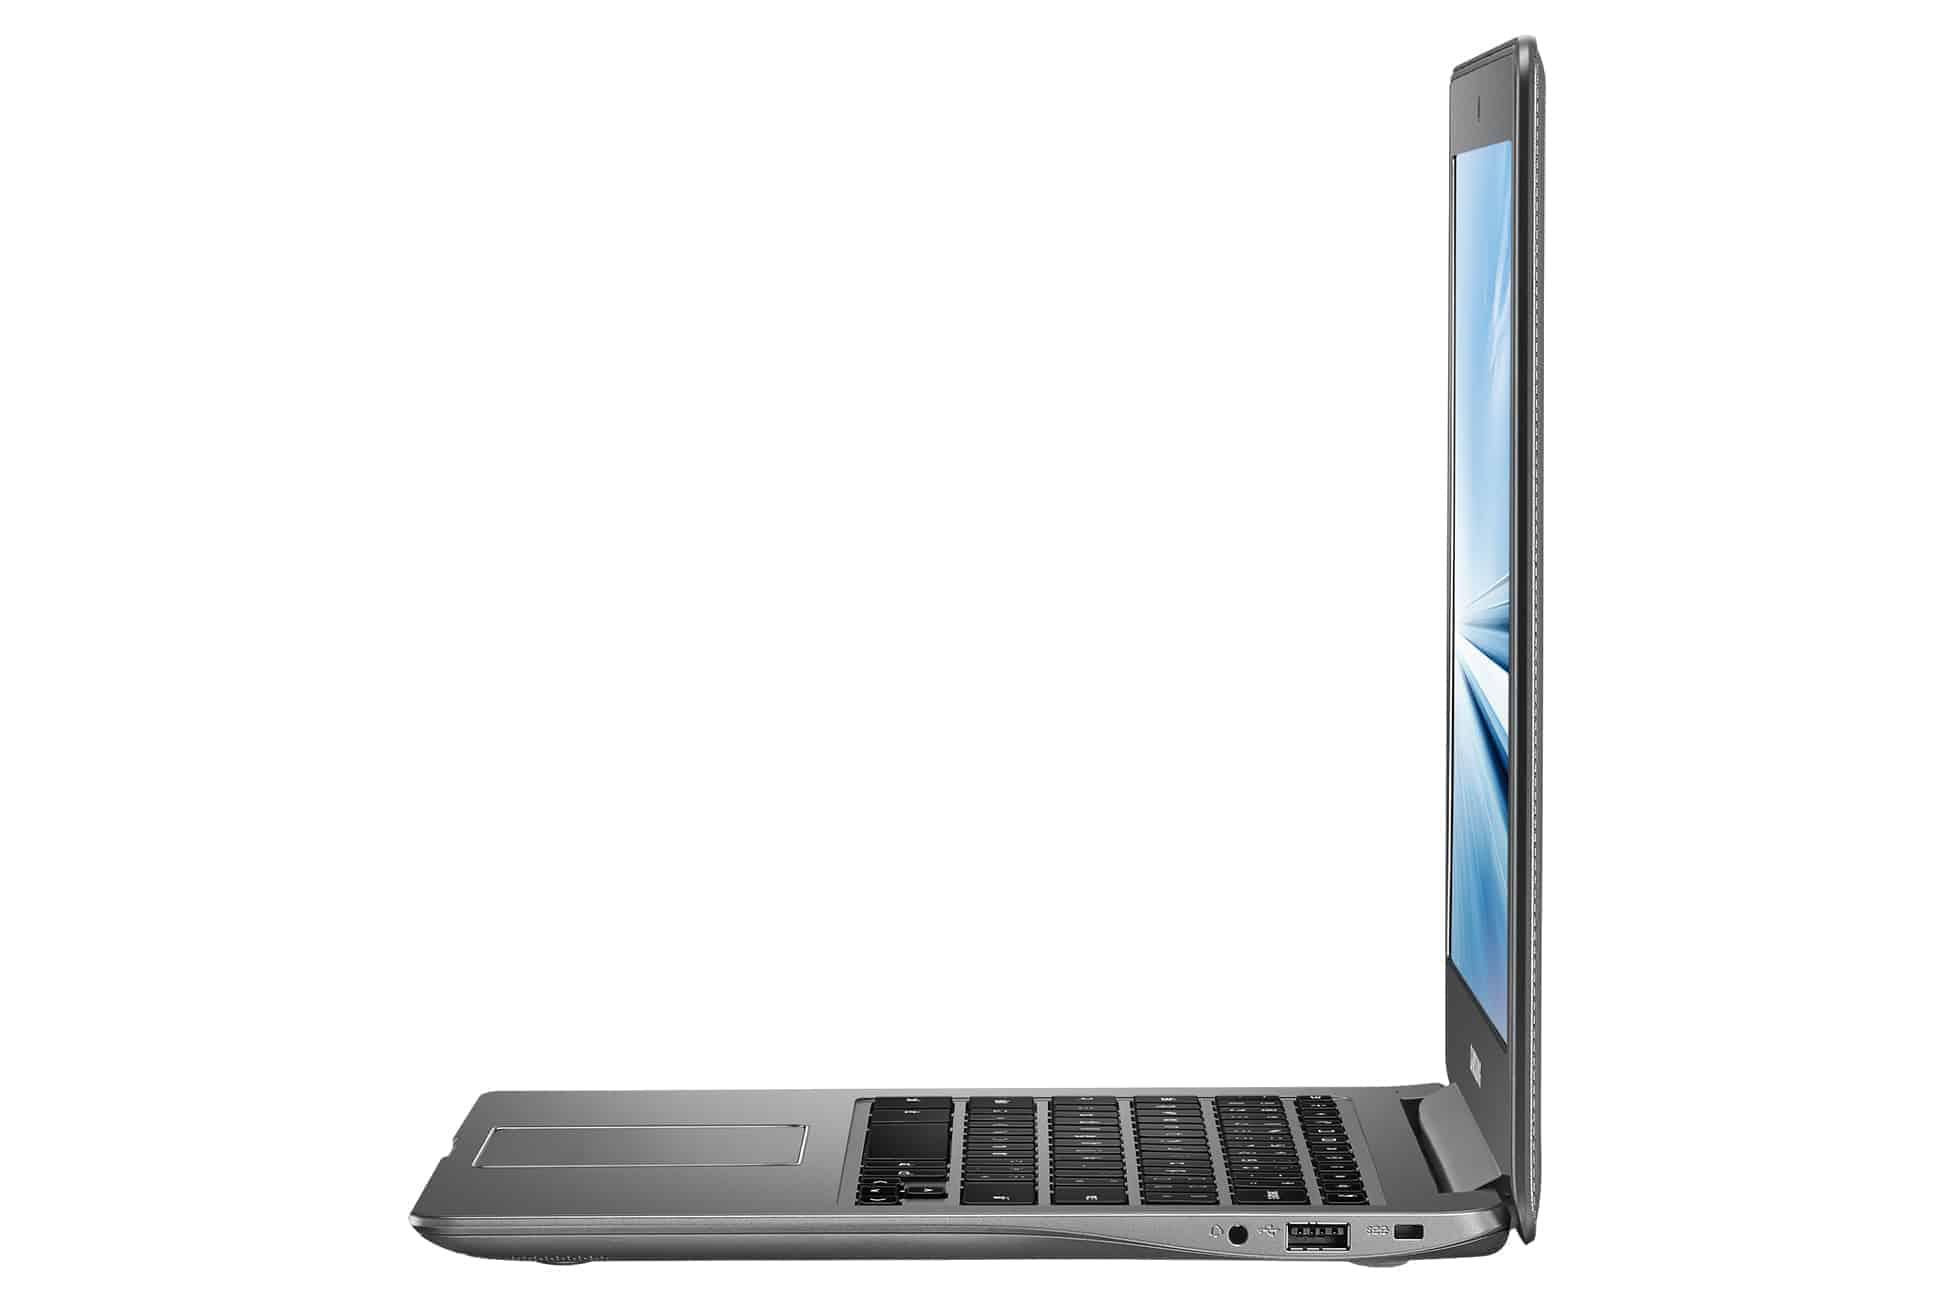 Chromebook2 13 005 Side Open Titanium Gray